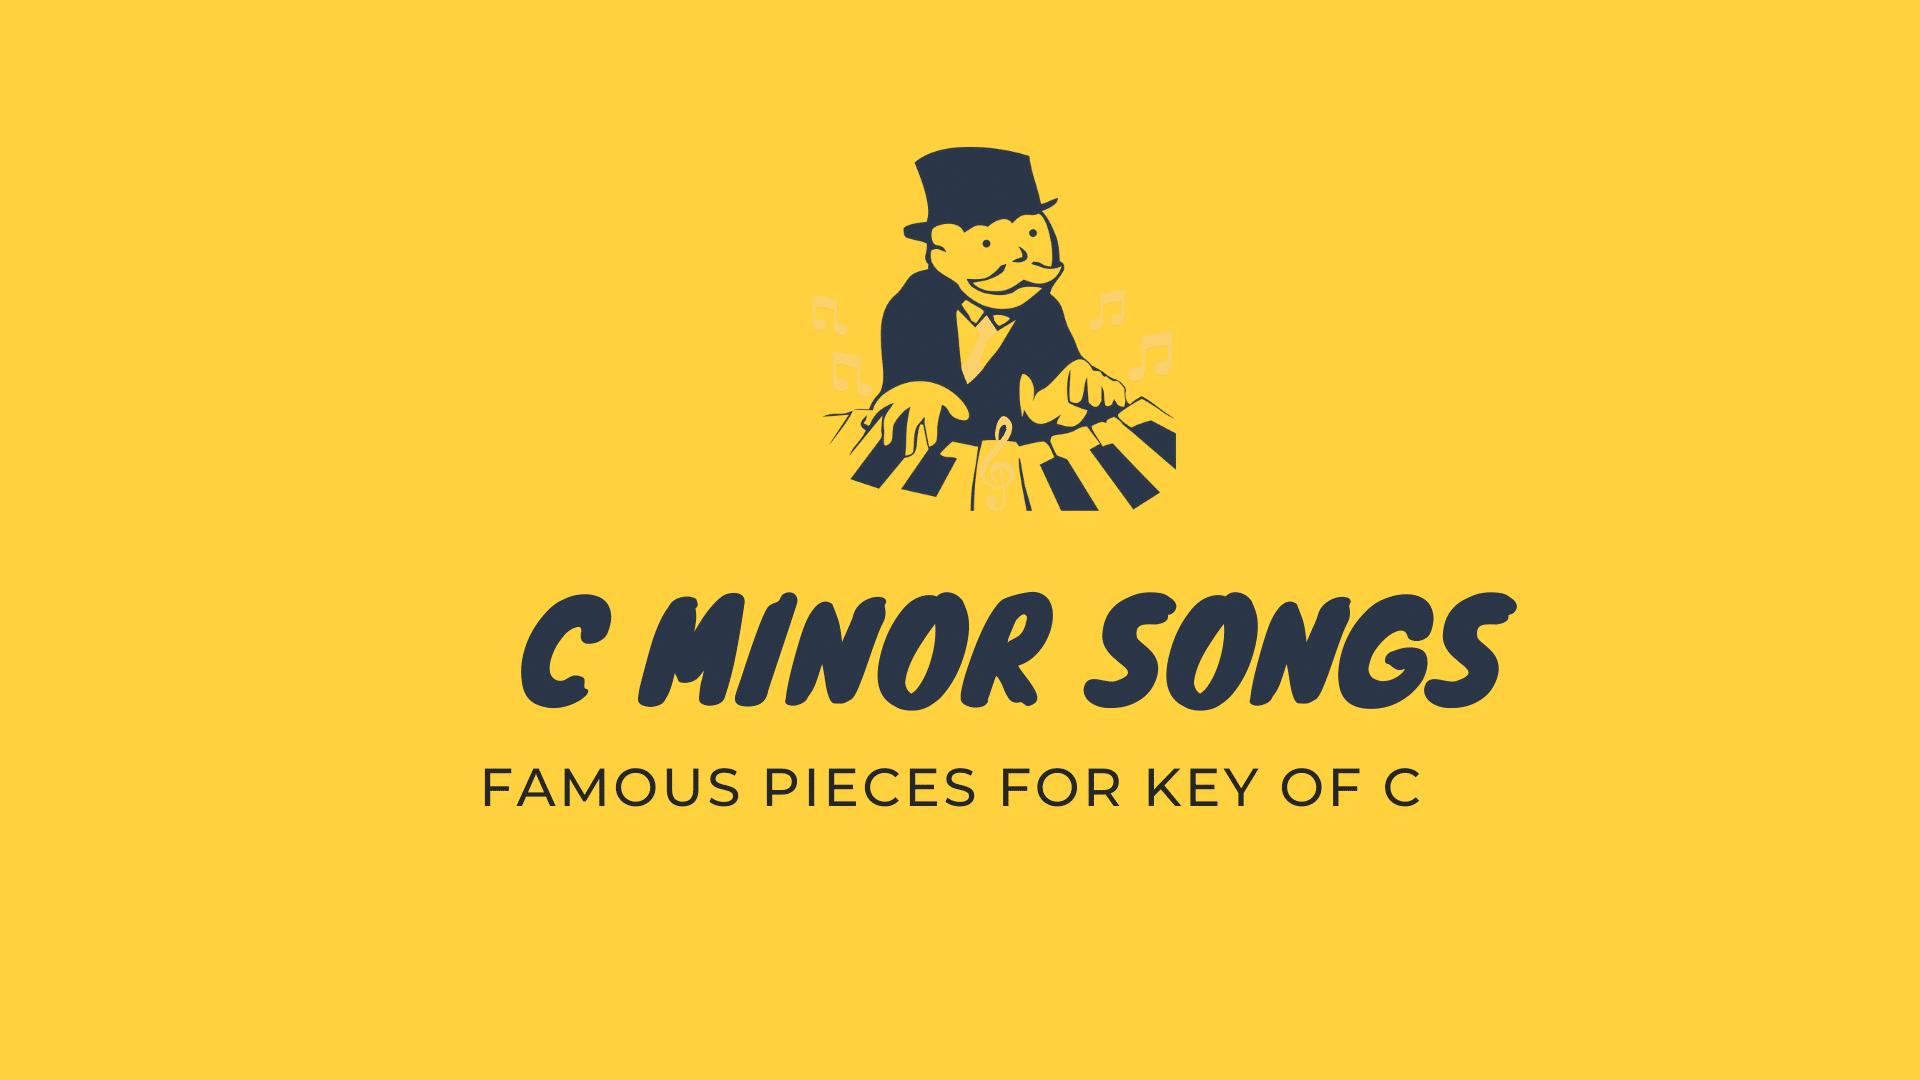 C Minor Songs